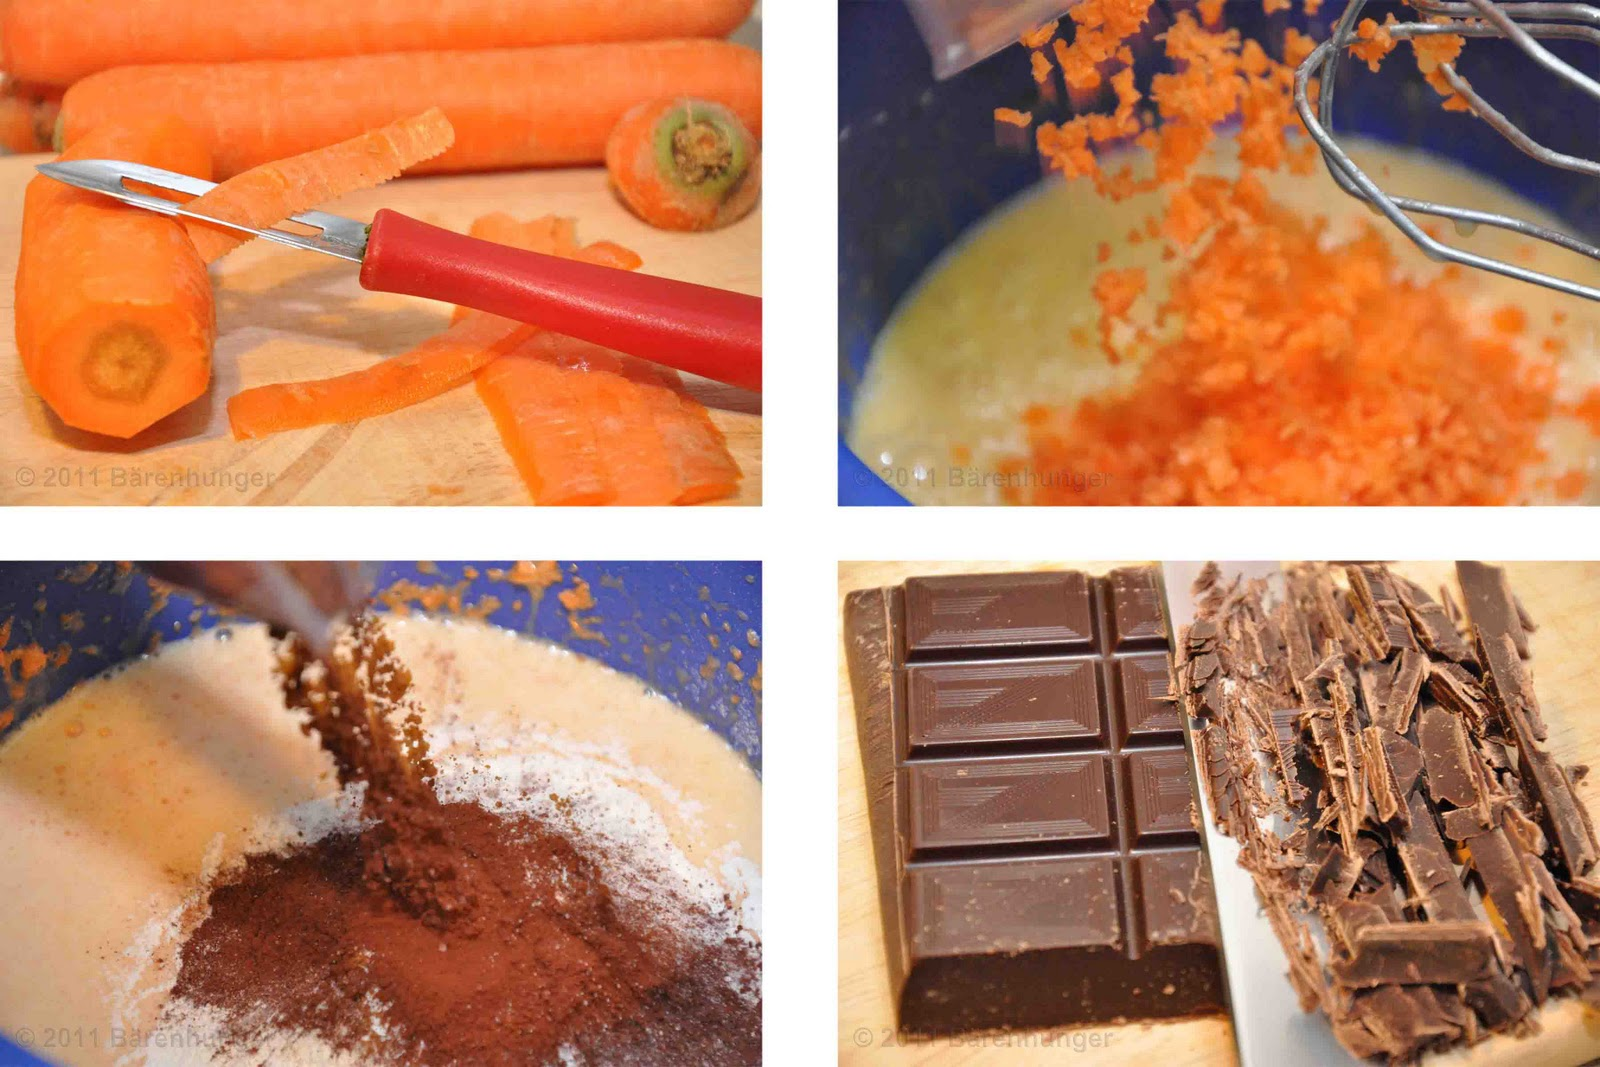 karotten schokoladen kuchen b renhunger. Black Bedroom Furniture Sets. Home Design Ideas